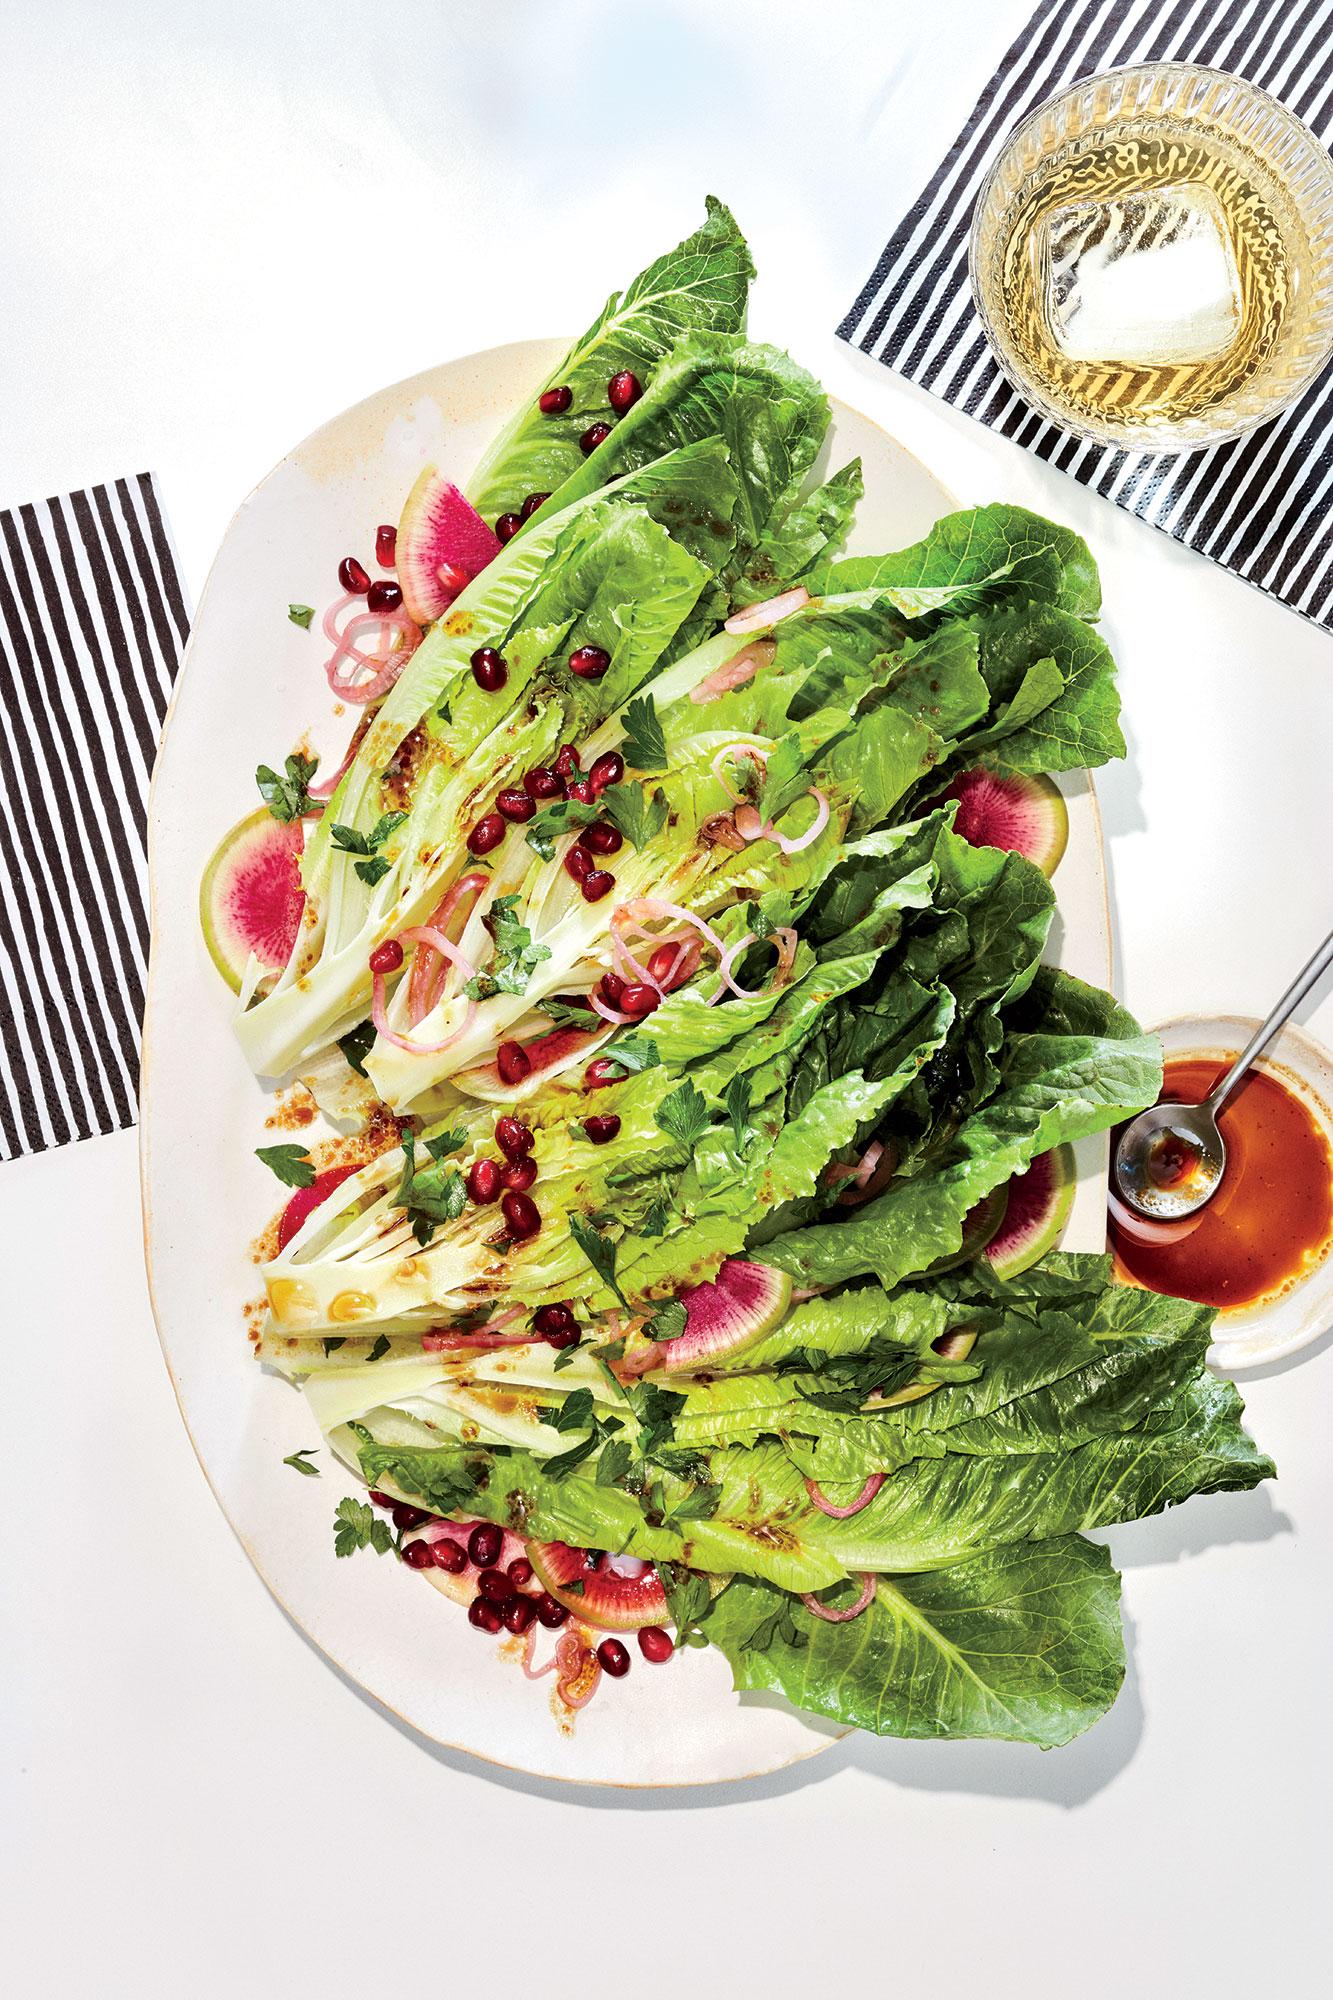 Crunchy Greens with Radish